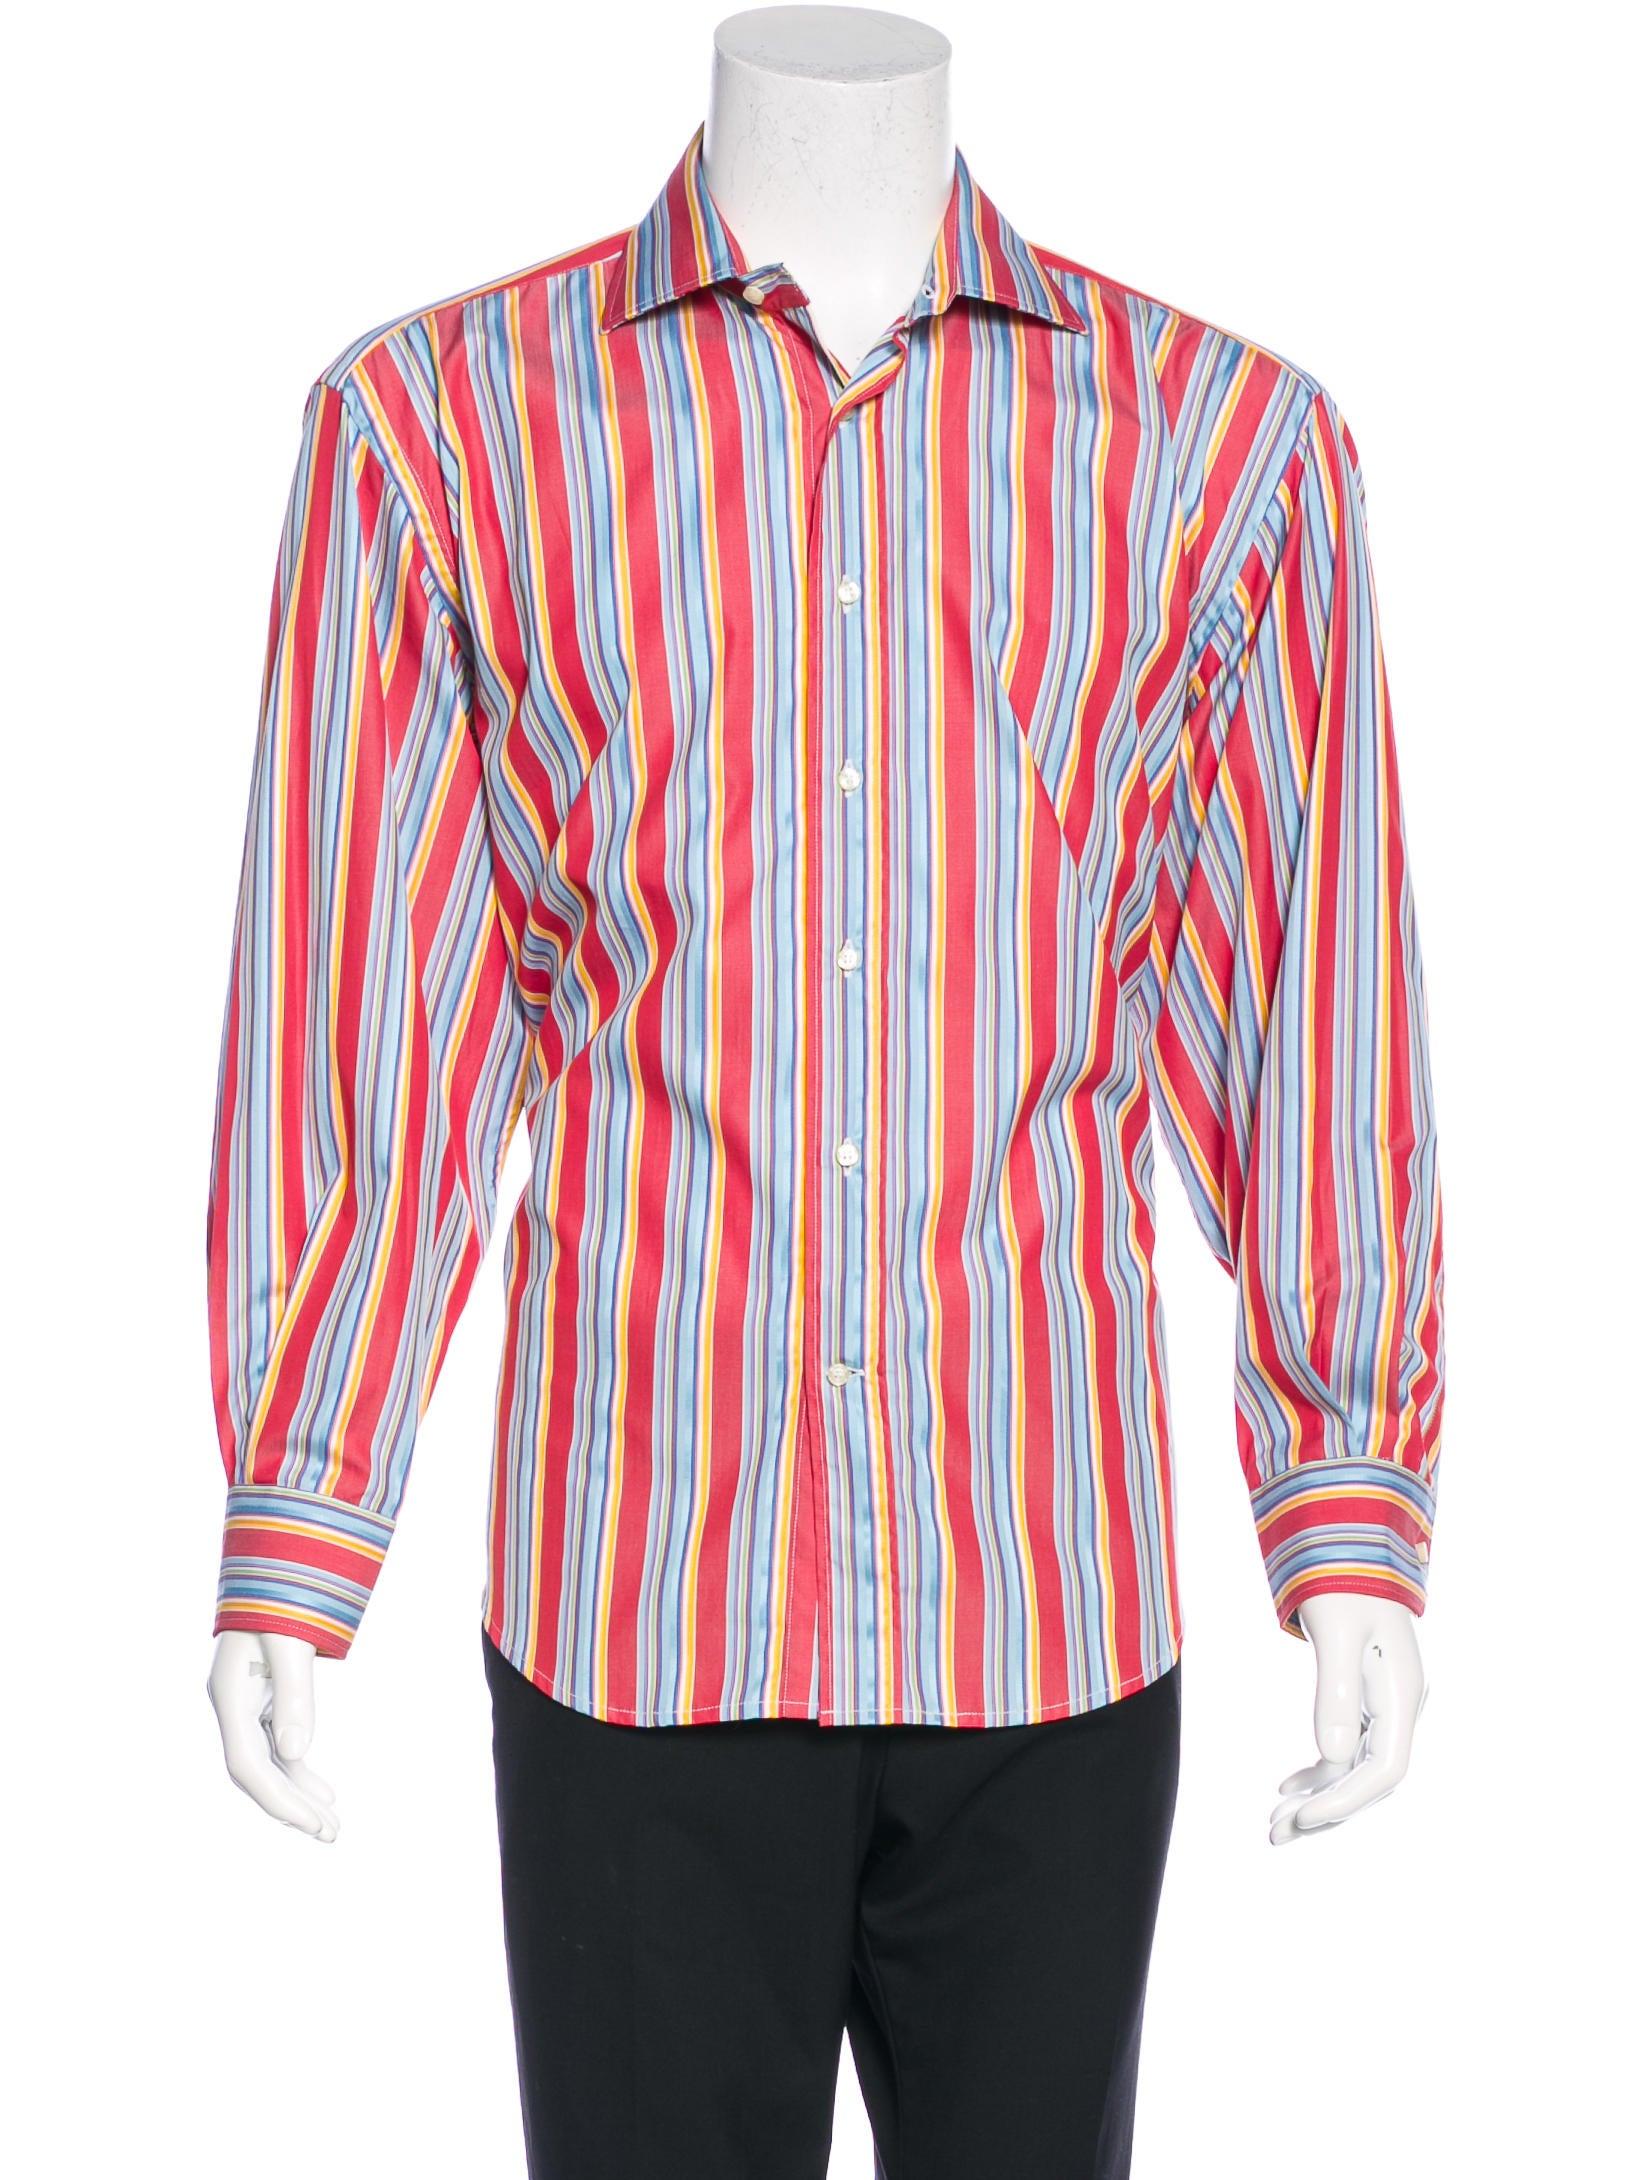 Etro striped woven shirt mens shirts etr44011 the for Etro men s shirts